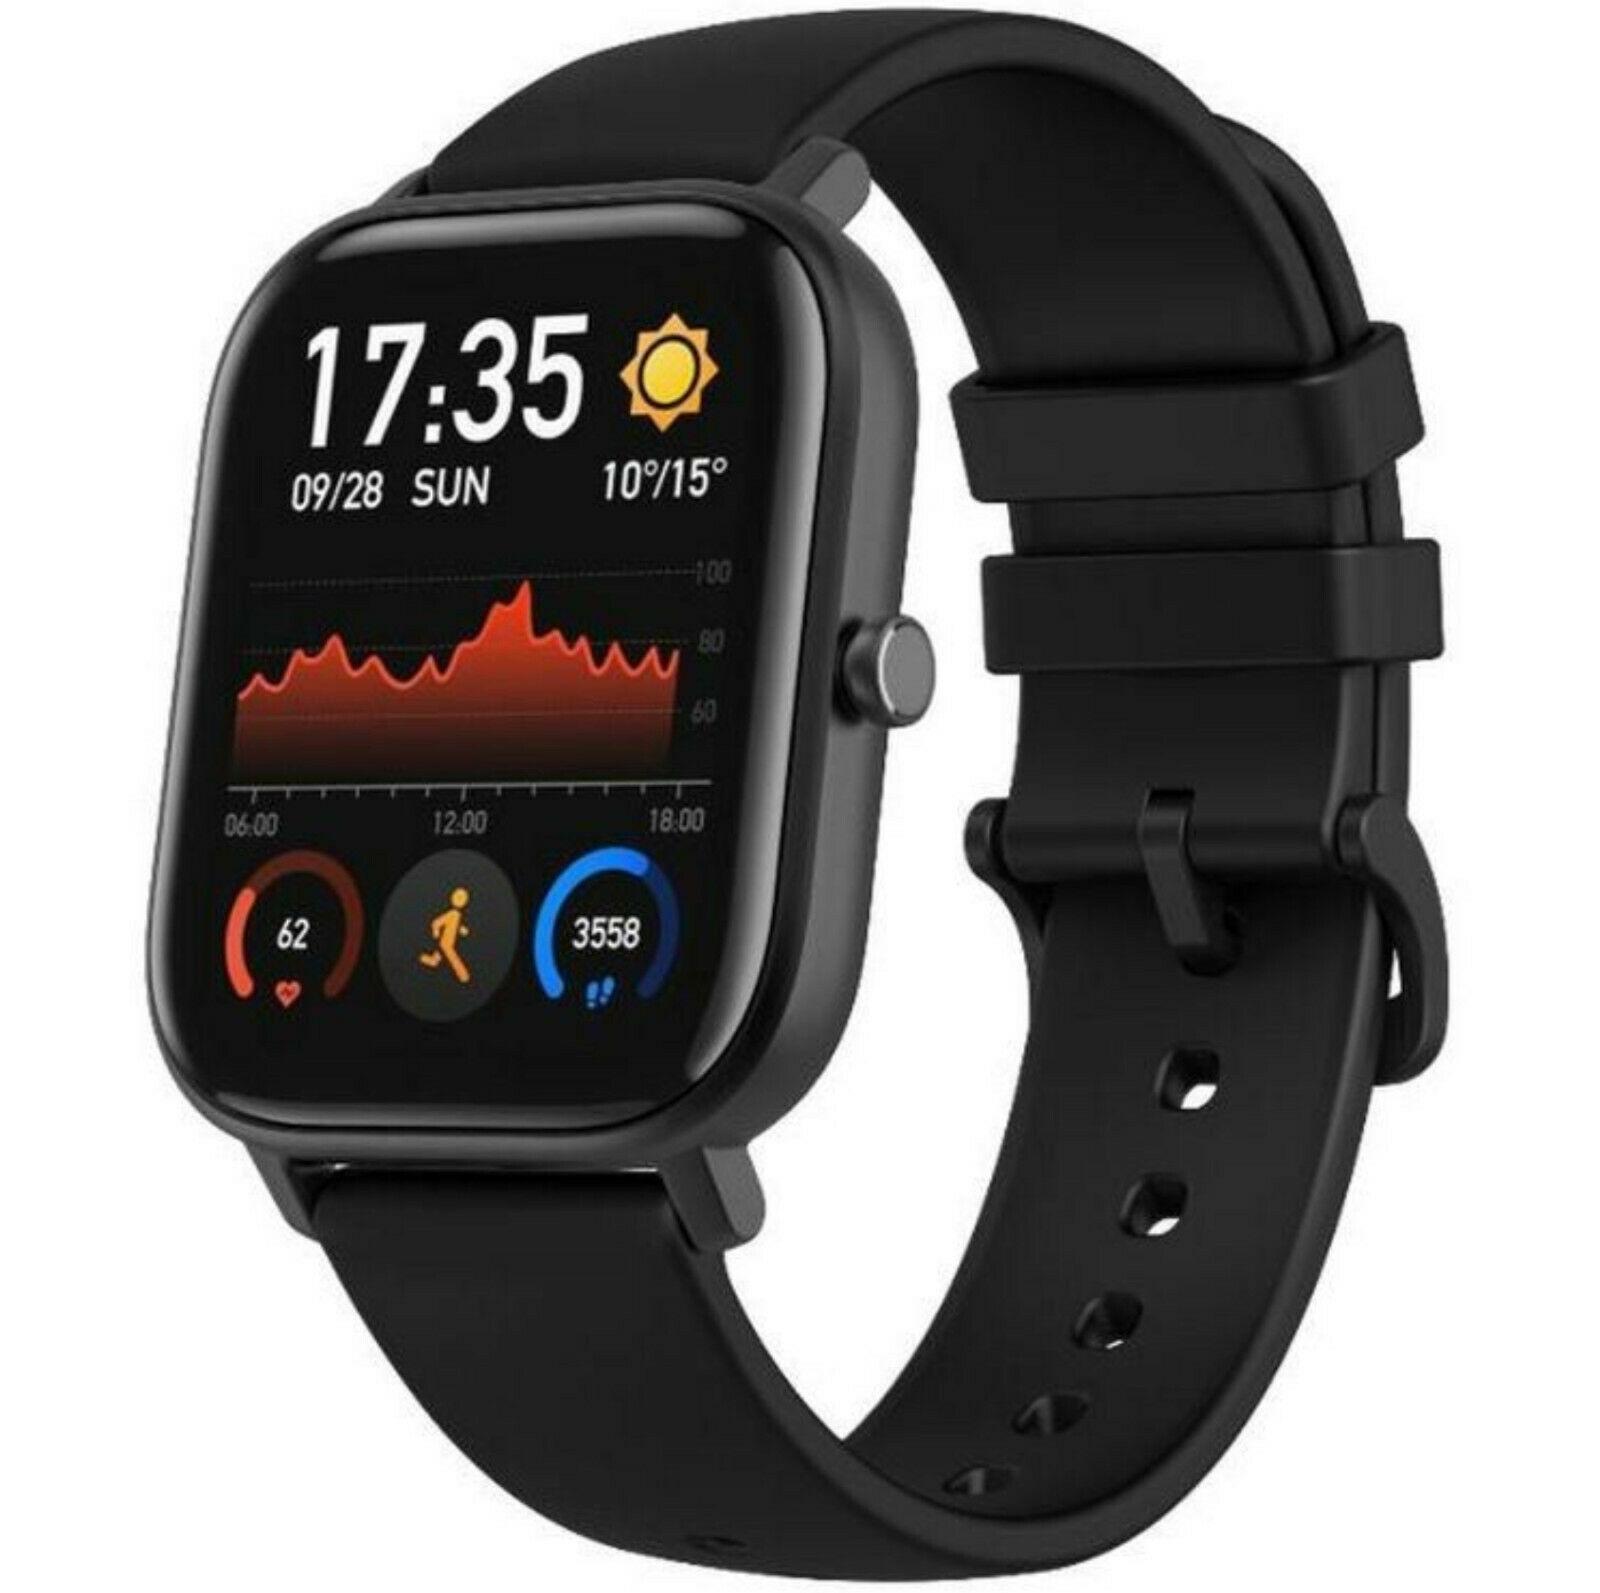 Huami Amazfit GTS Obsidian Black Smart Watch